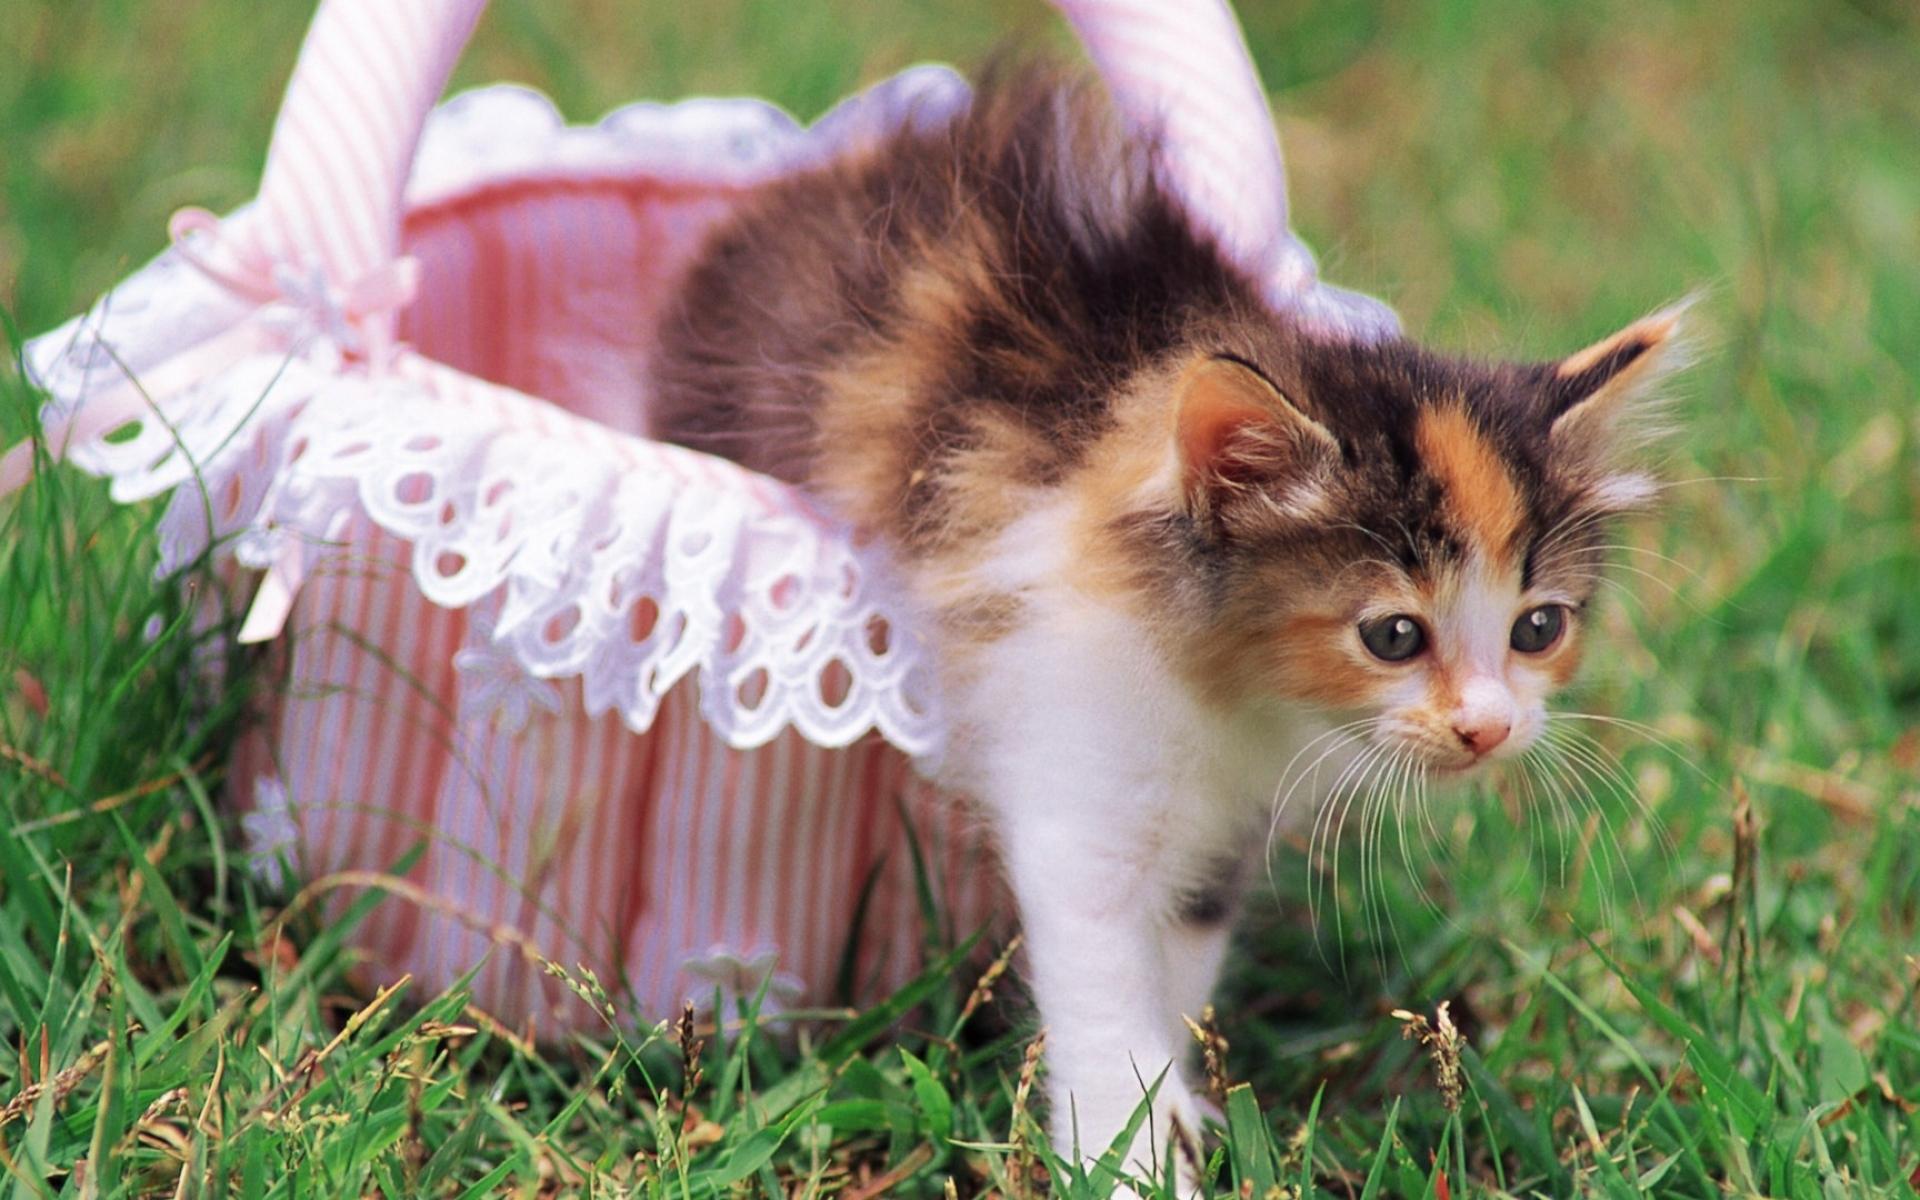 Картинки Котенок, кошка, корзина, трава, красивые фото и обои на рабочий стол